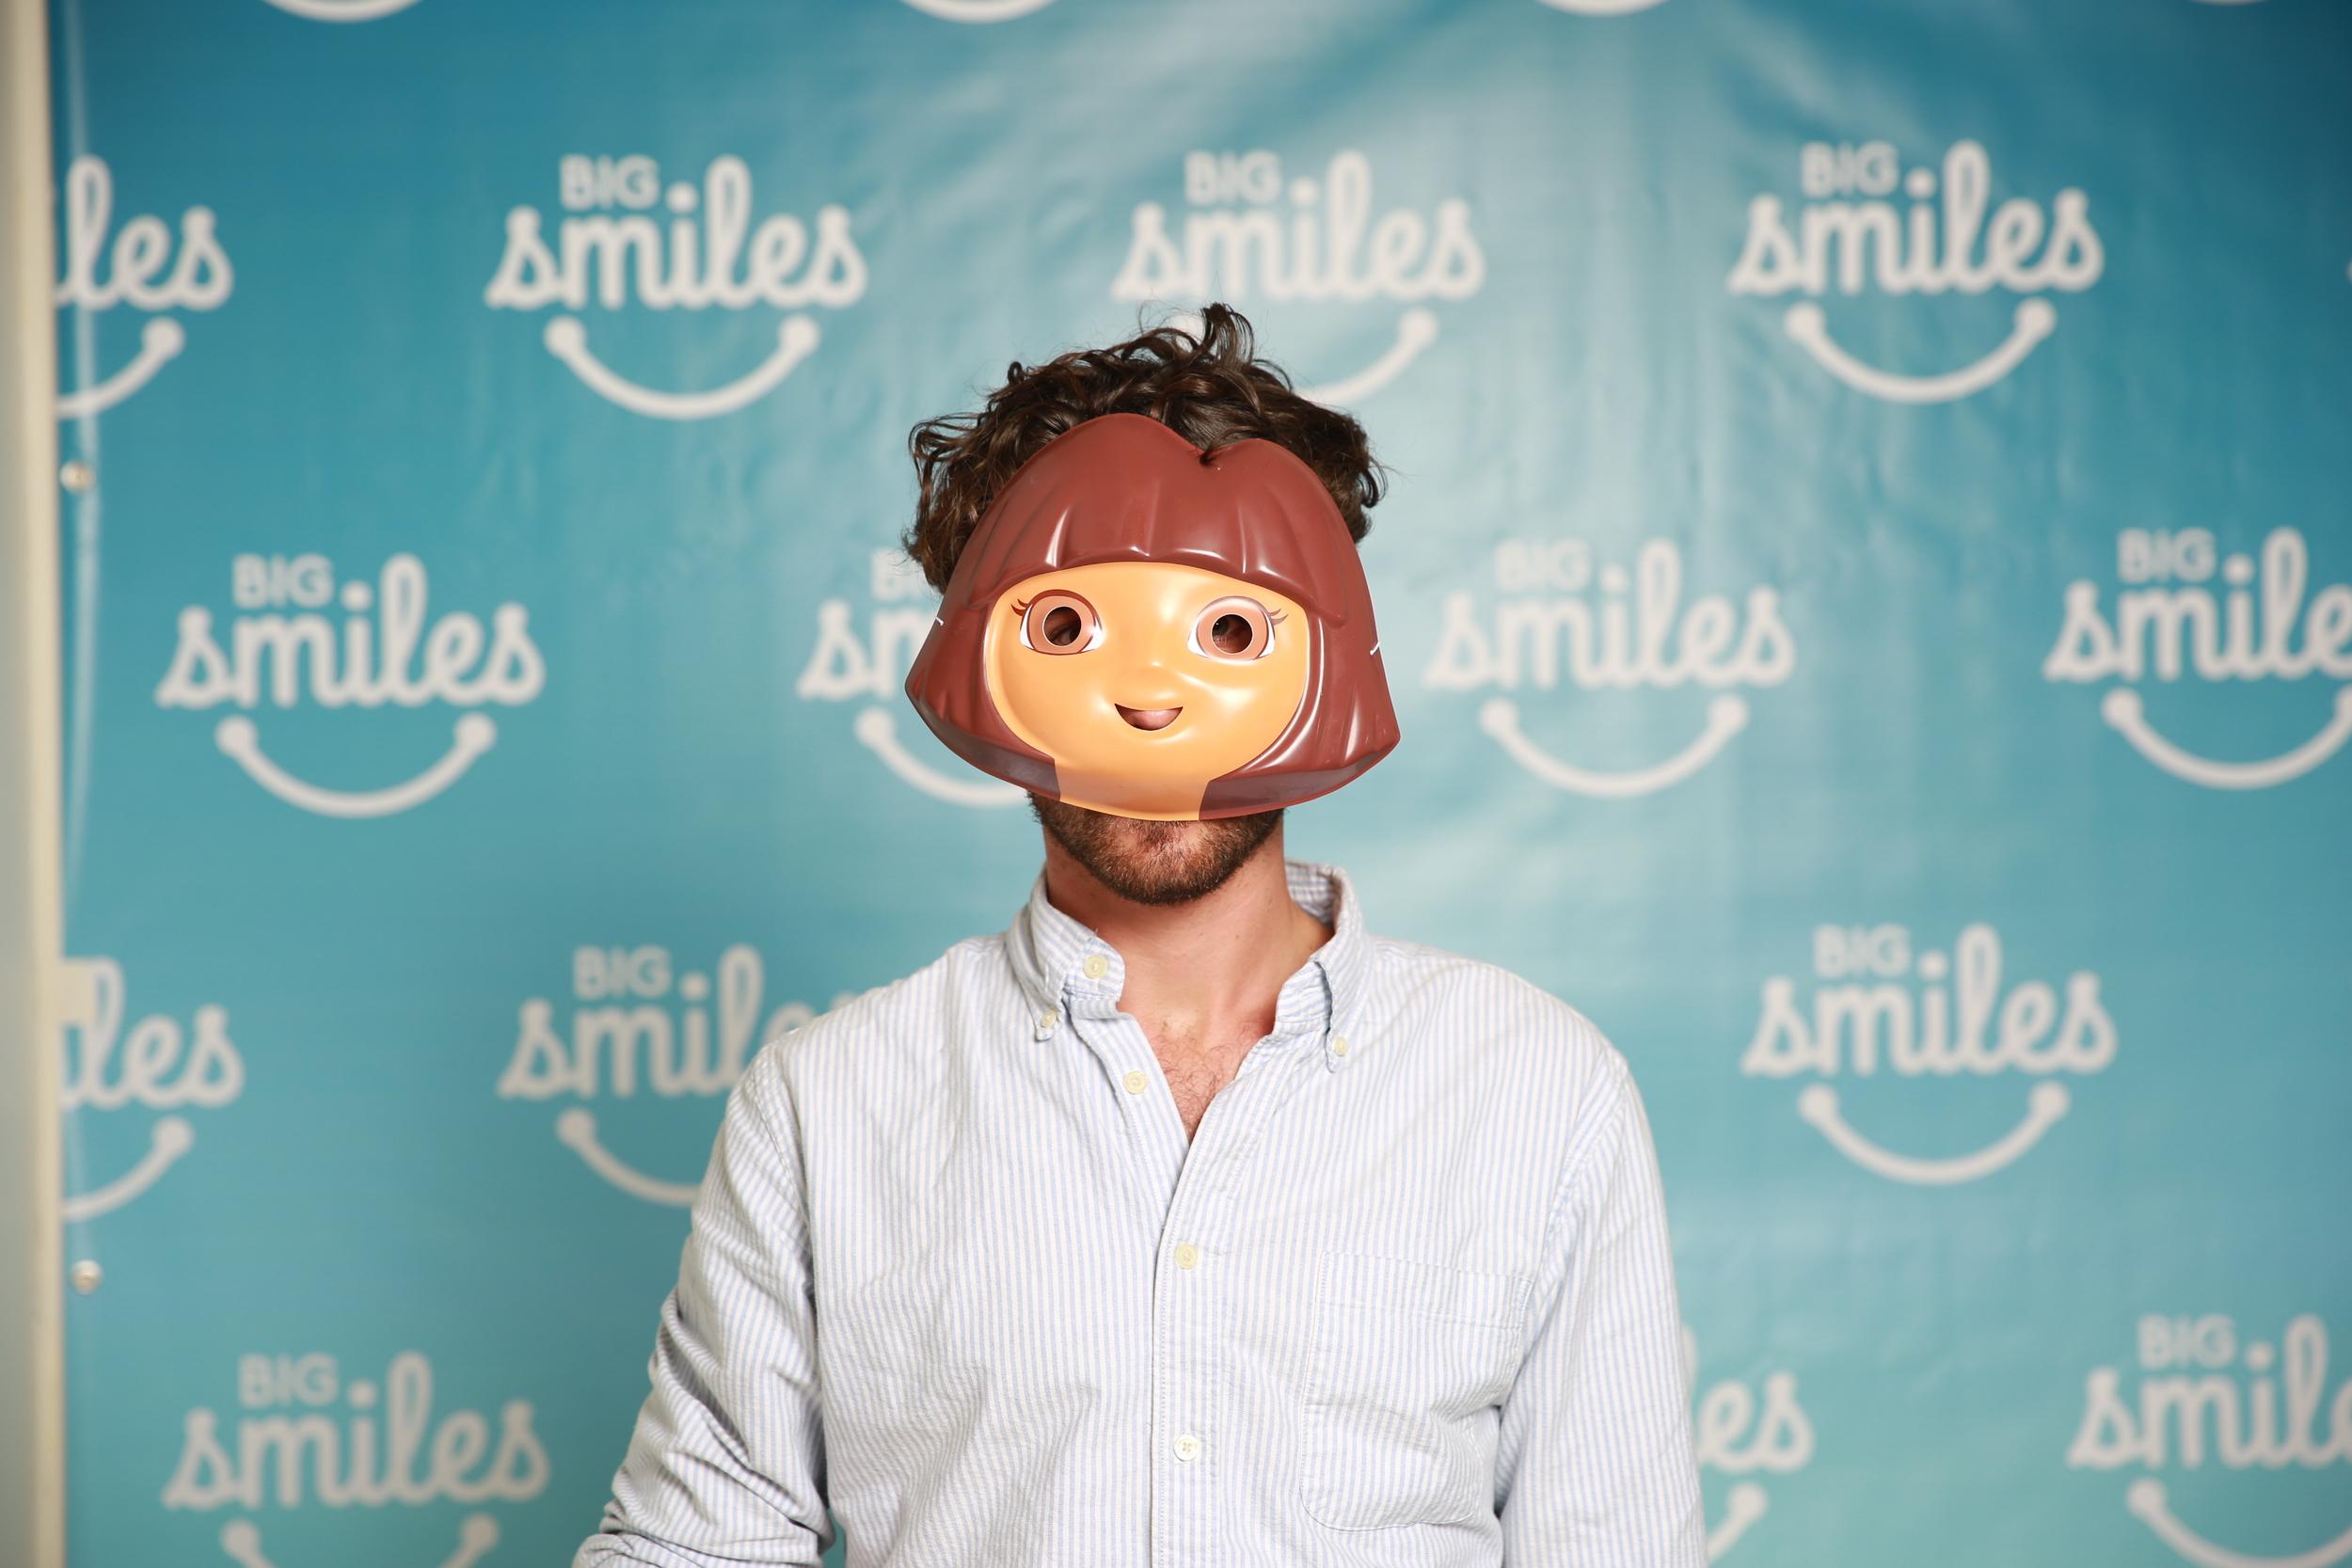 7.30.16 Big Smiles Program-039.JPG